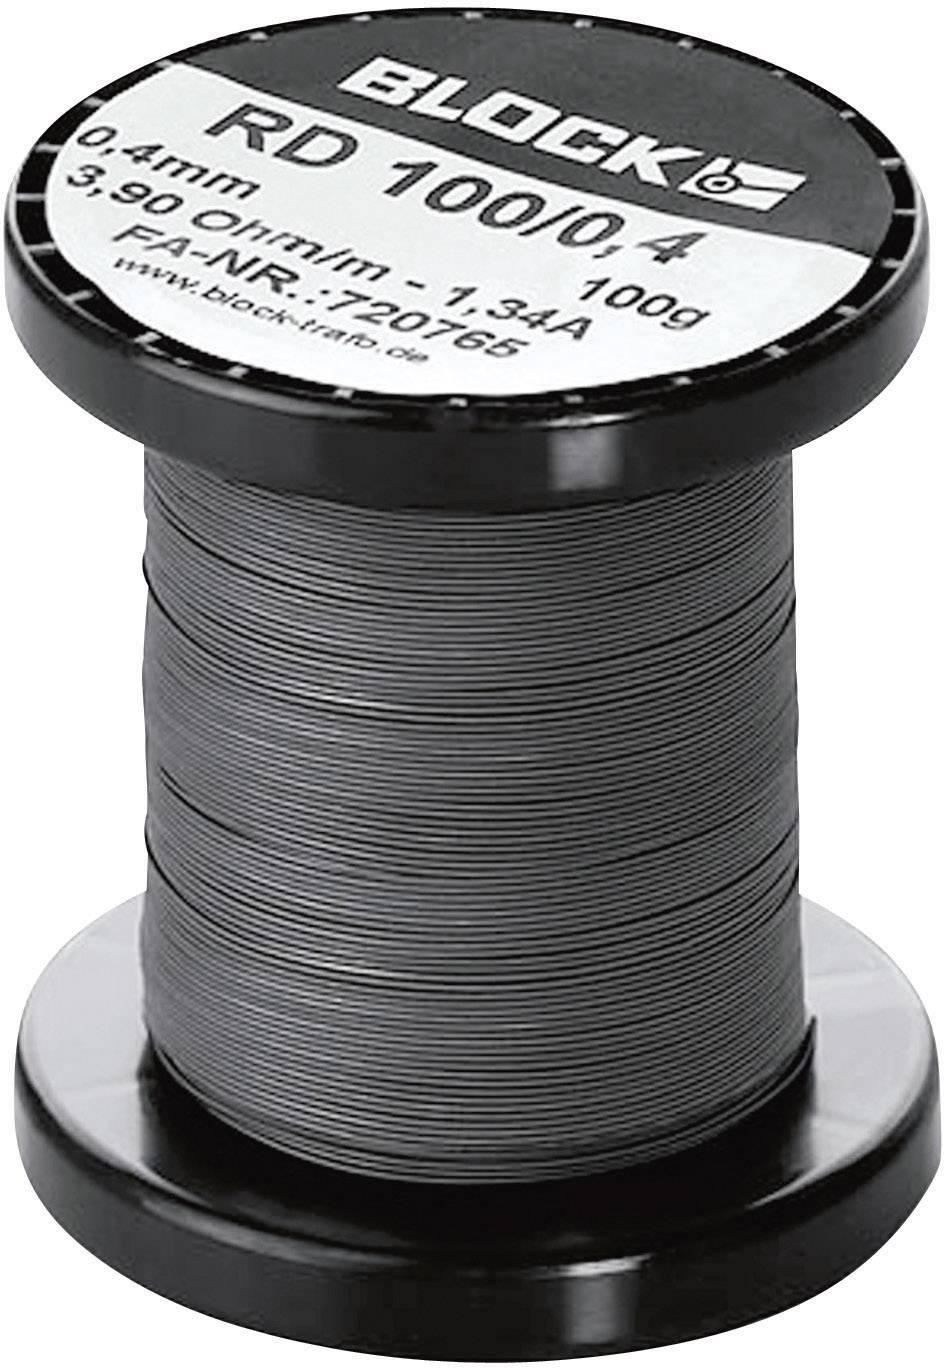 Odporový drát (konstantan) 0.624 Ω/m Block RD 100/1,0 14 m